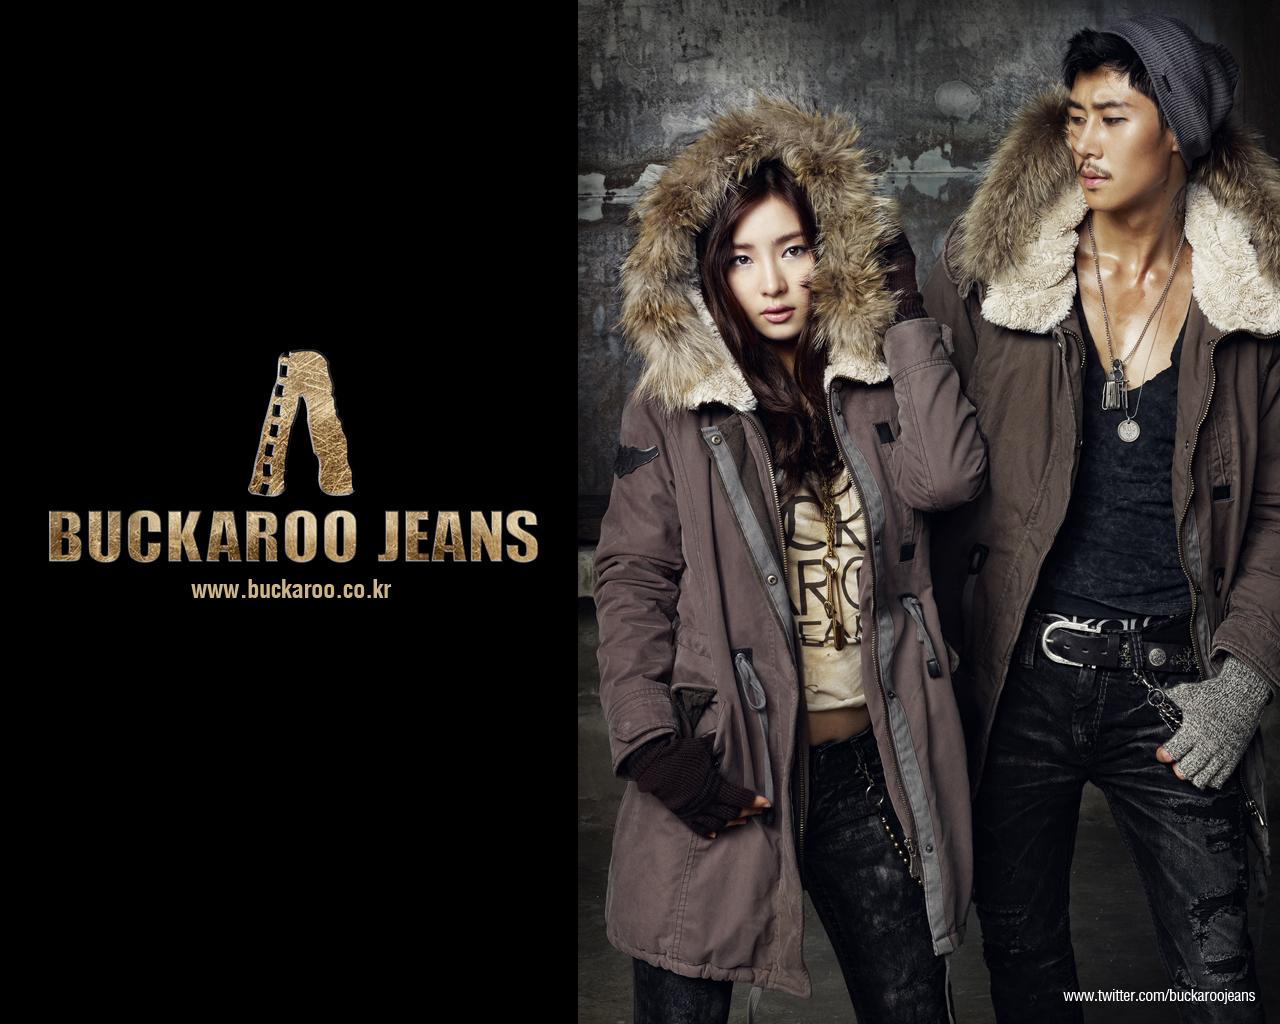 Buckaroo Jeans